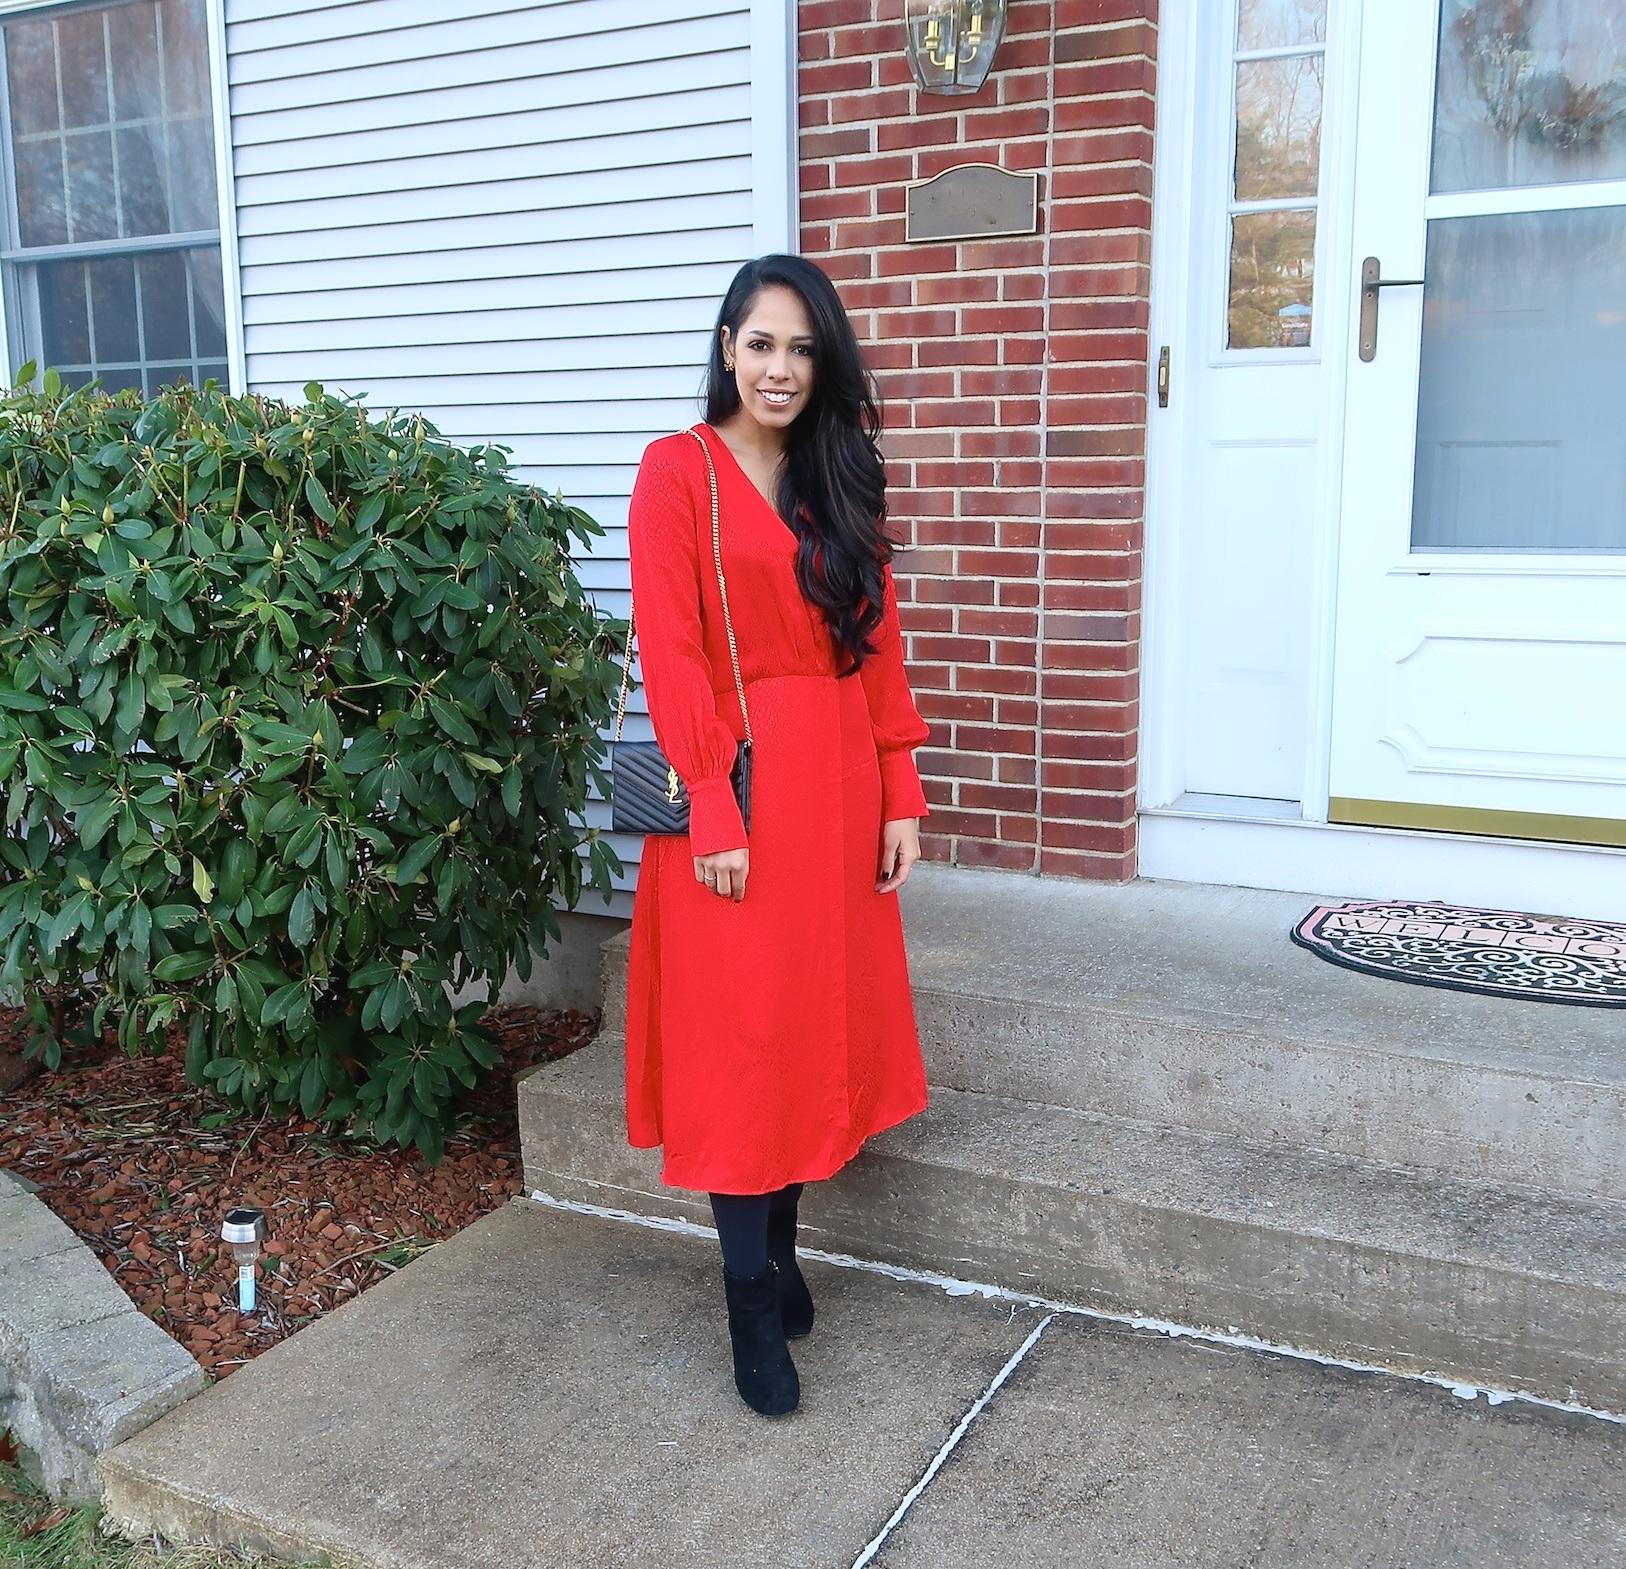 christmas-eve-outfit-idea-red-dress-fashion-blog.jpg